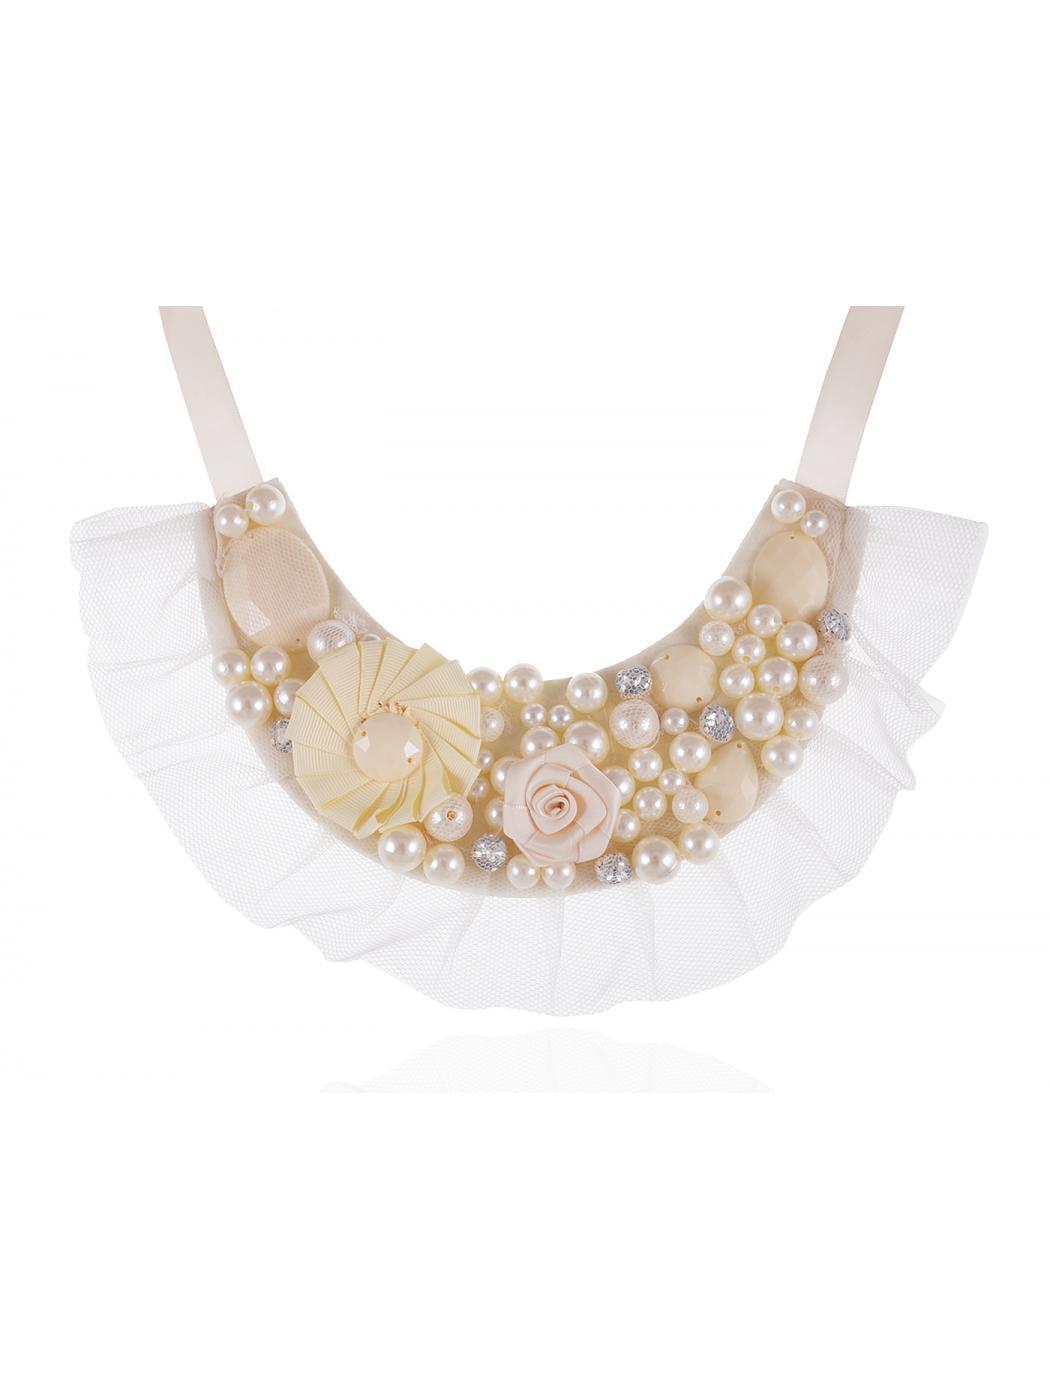 Bridal Wedding Ivory White Cream Beaded Ribbon Floral Fabric Decor Bib Necklace by